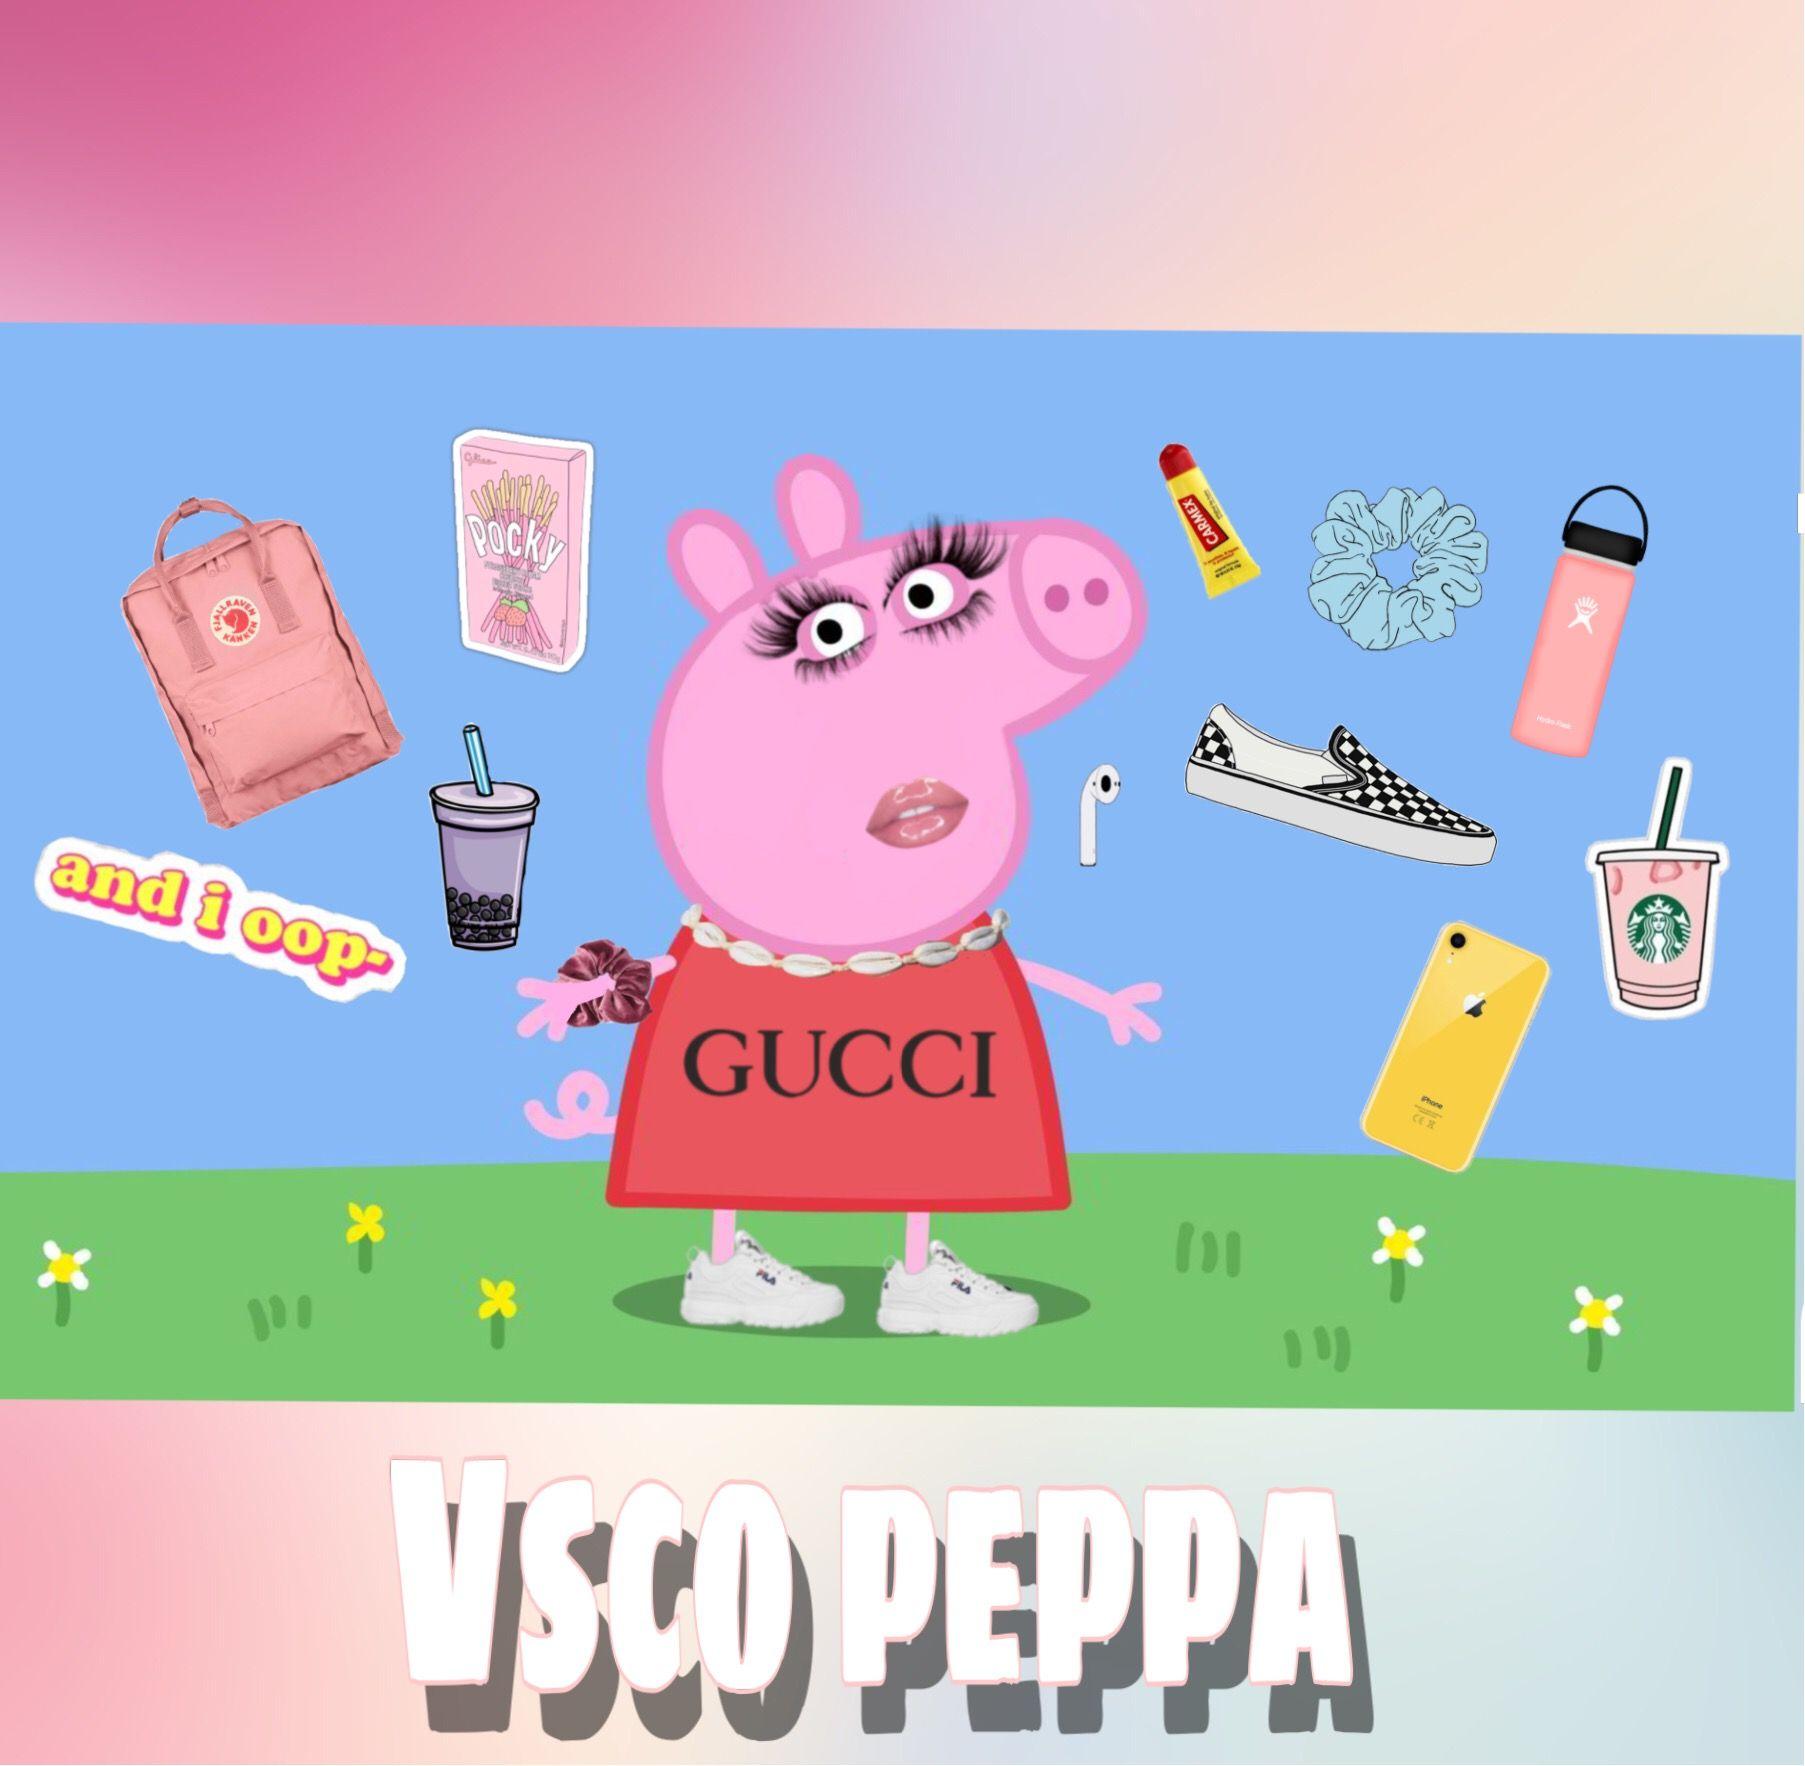 Vsco Peppa Pig Peppaedit Freetoedit Remixed From Peachy Raven Vscoxqueen Picsartchallenges Peppa Pig Wallpaper Peppa Pig Memes Peppa Pig Pictures